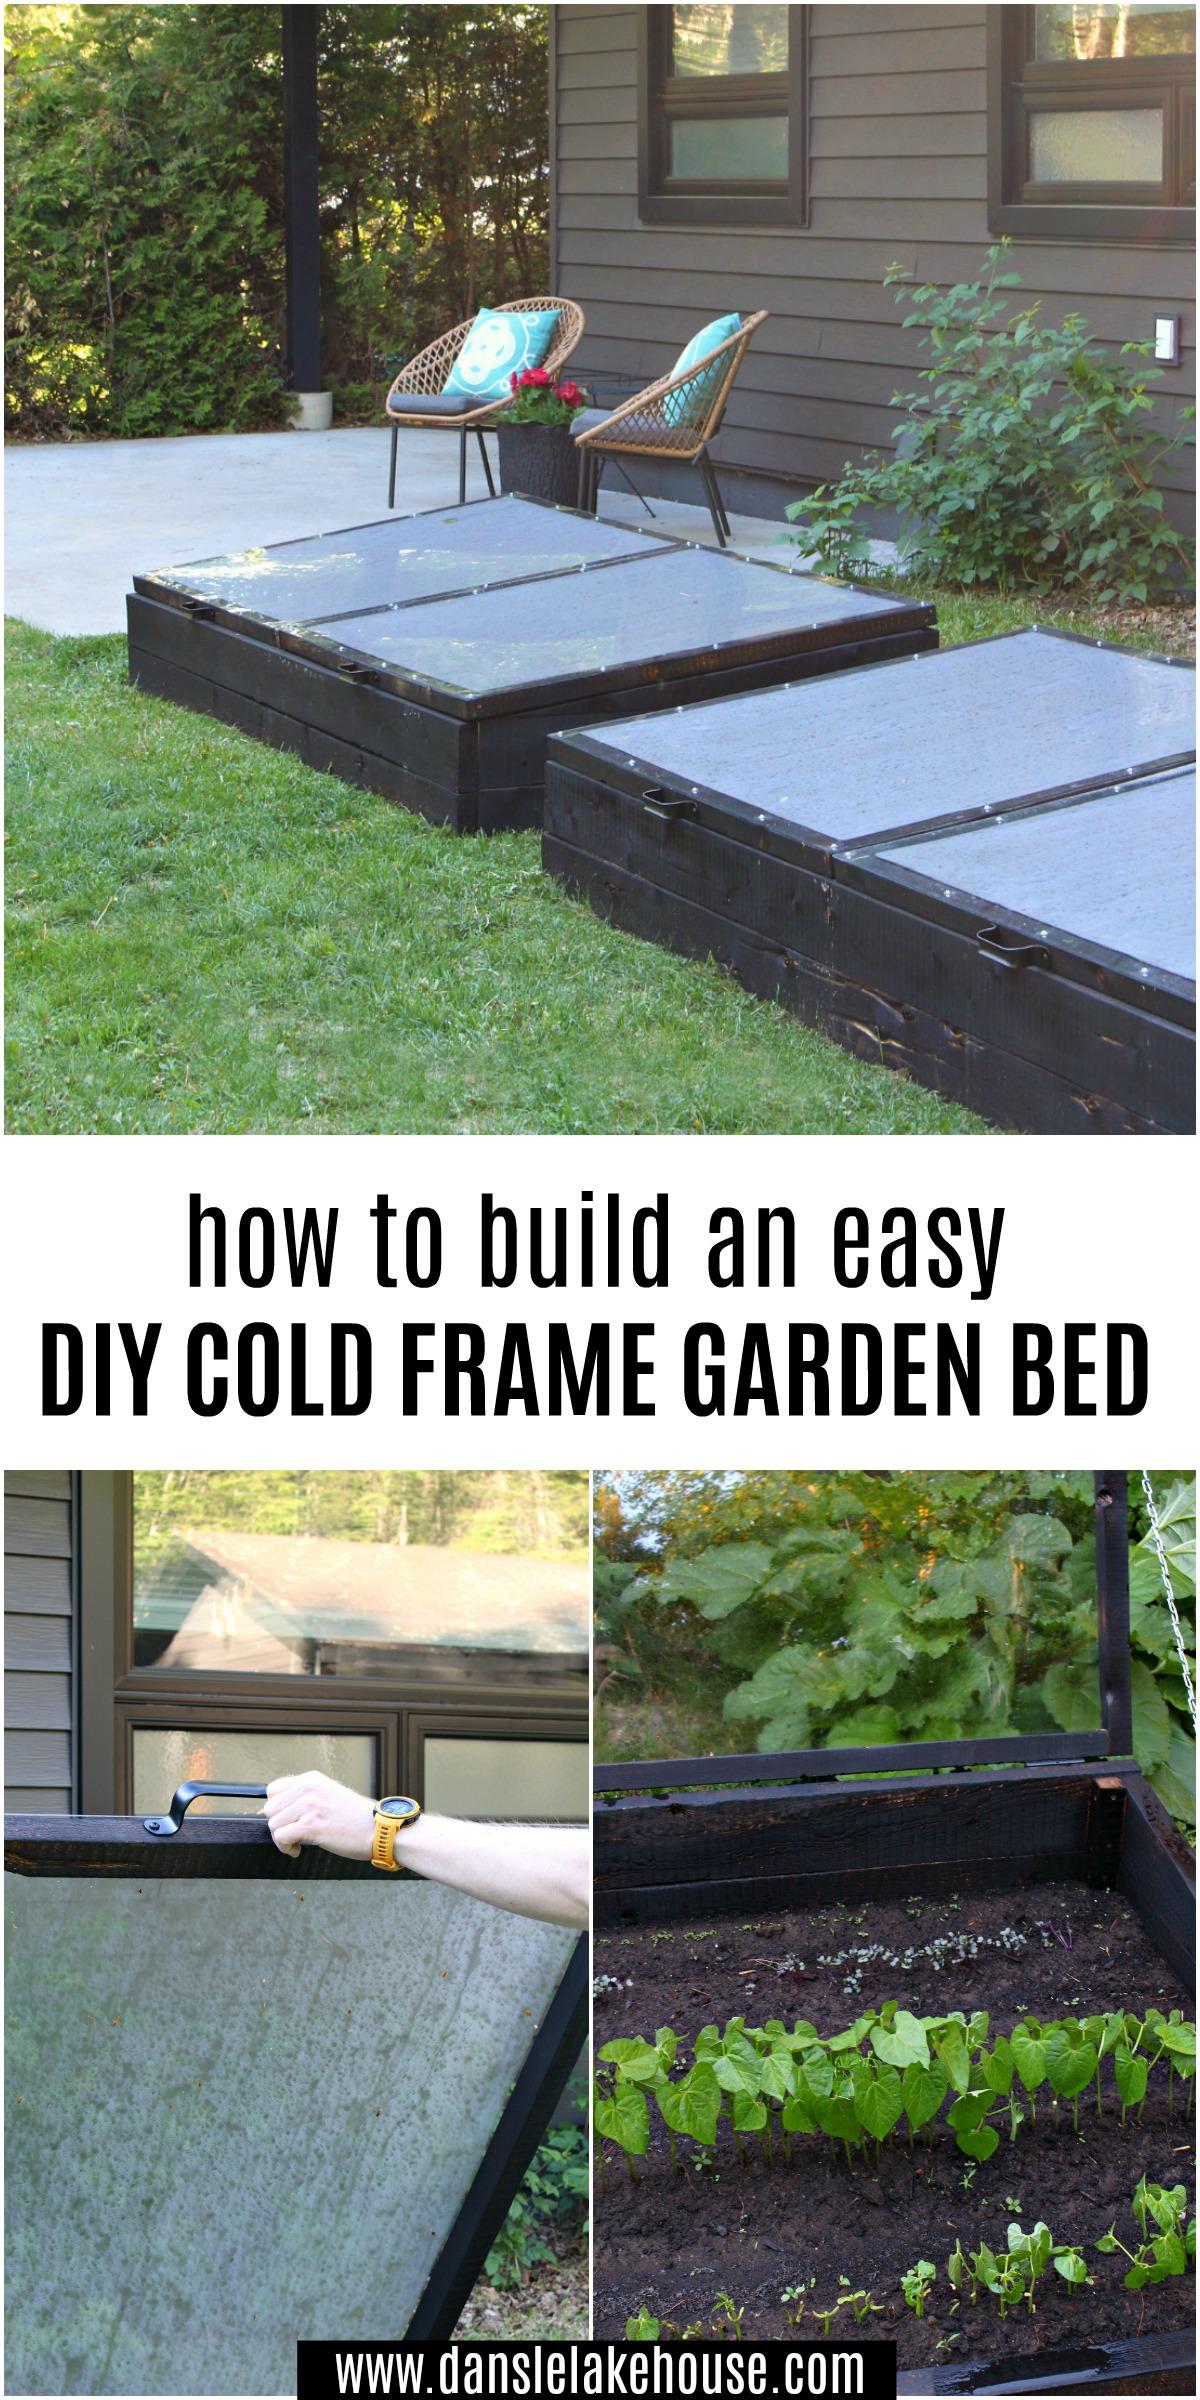 How to Build an Easy DIY Cold Frame Garden Bed